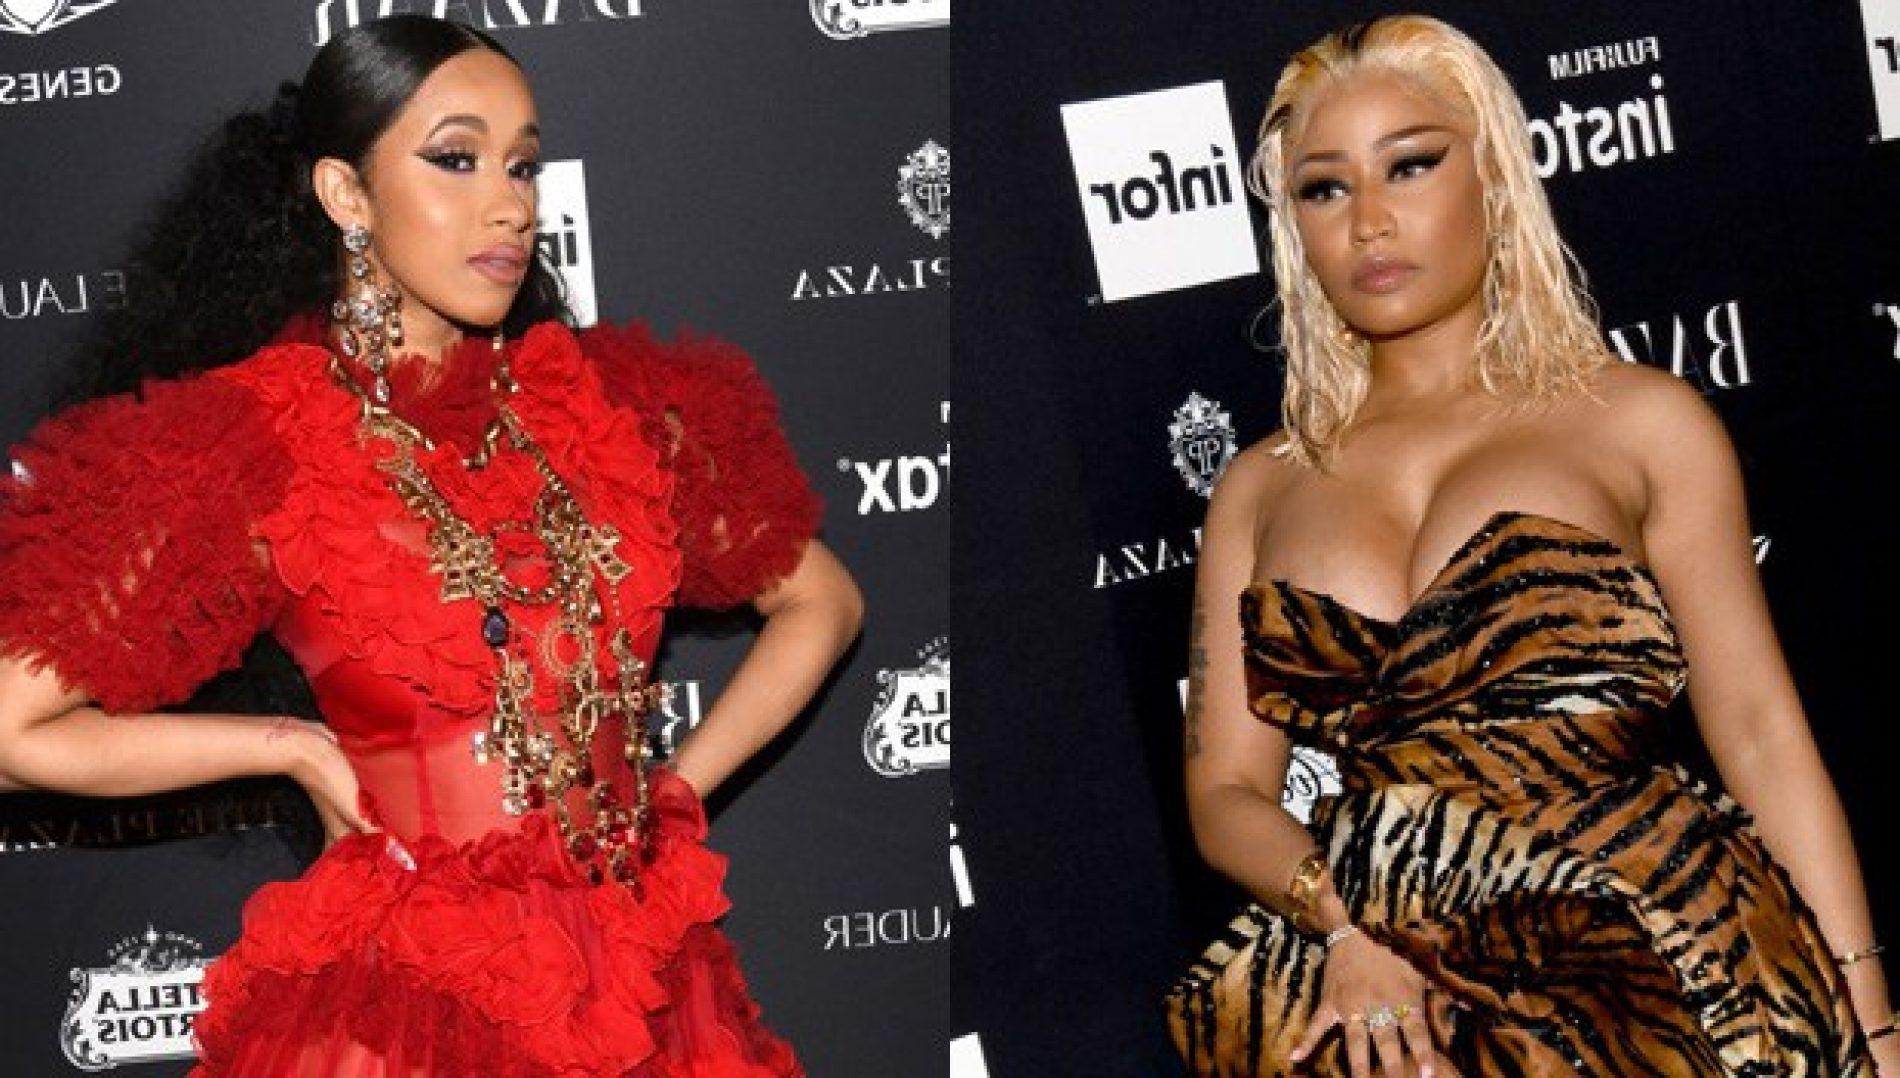 We now live in a Post-Cardi B/Nicki Minaj Fight World